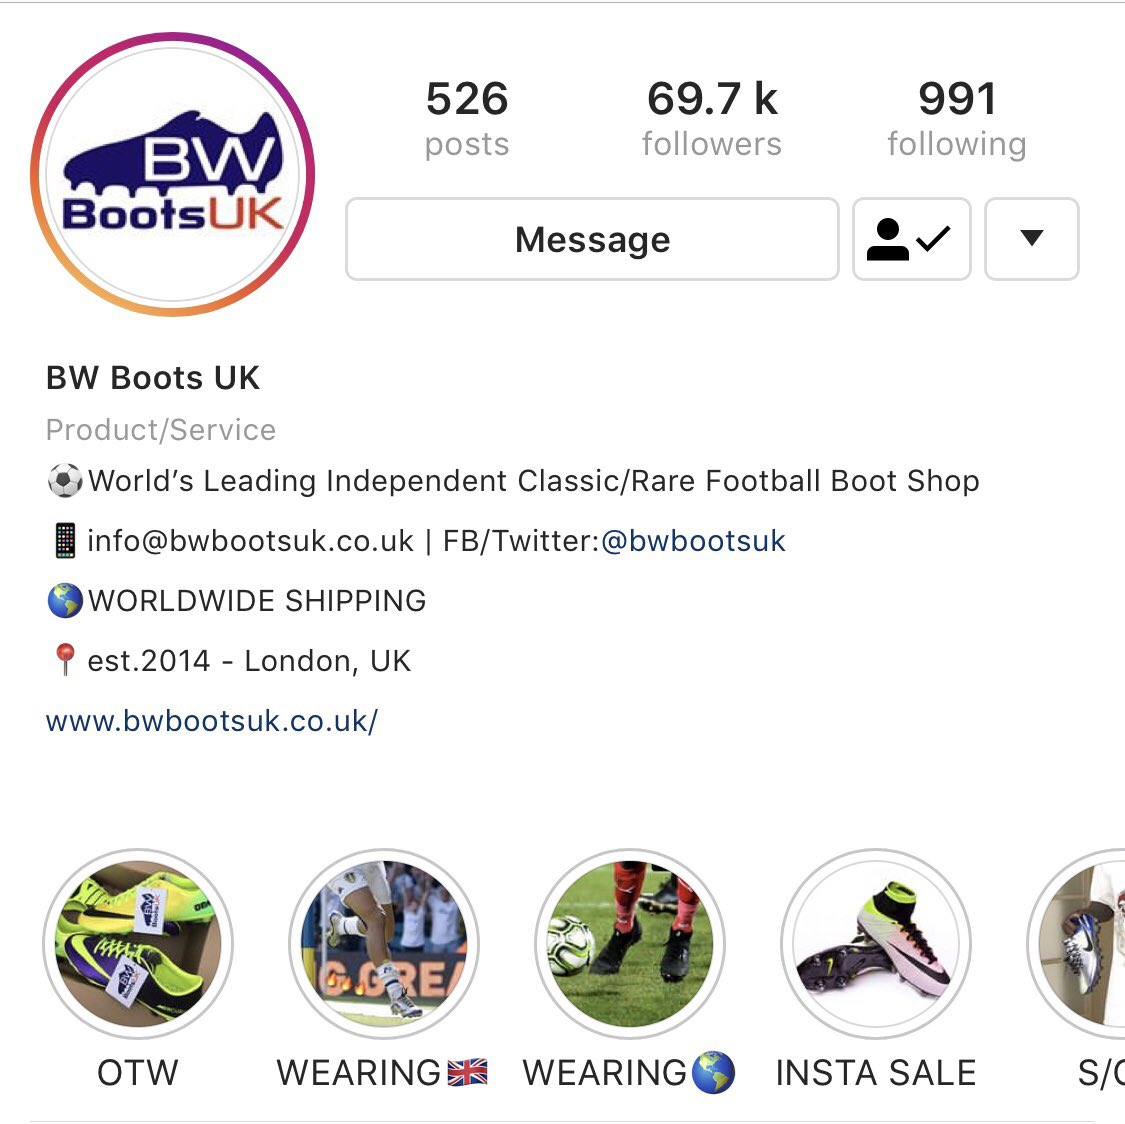 976813d23e01 BW Boots UK - @BWBOOTSUK Twitter Profile and Downloader | Twipu